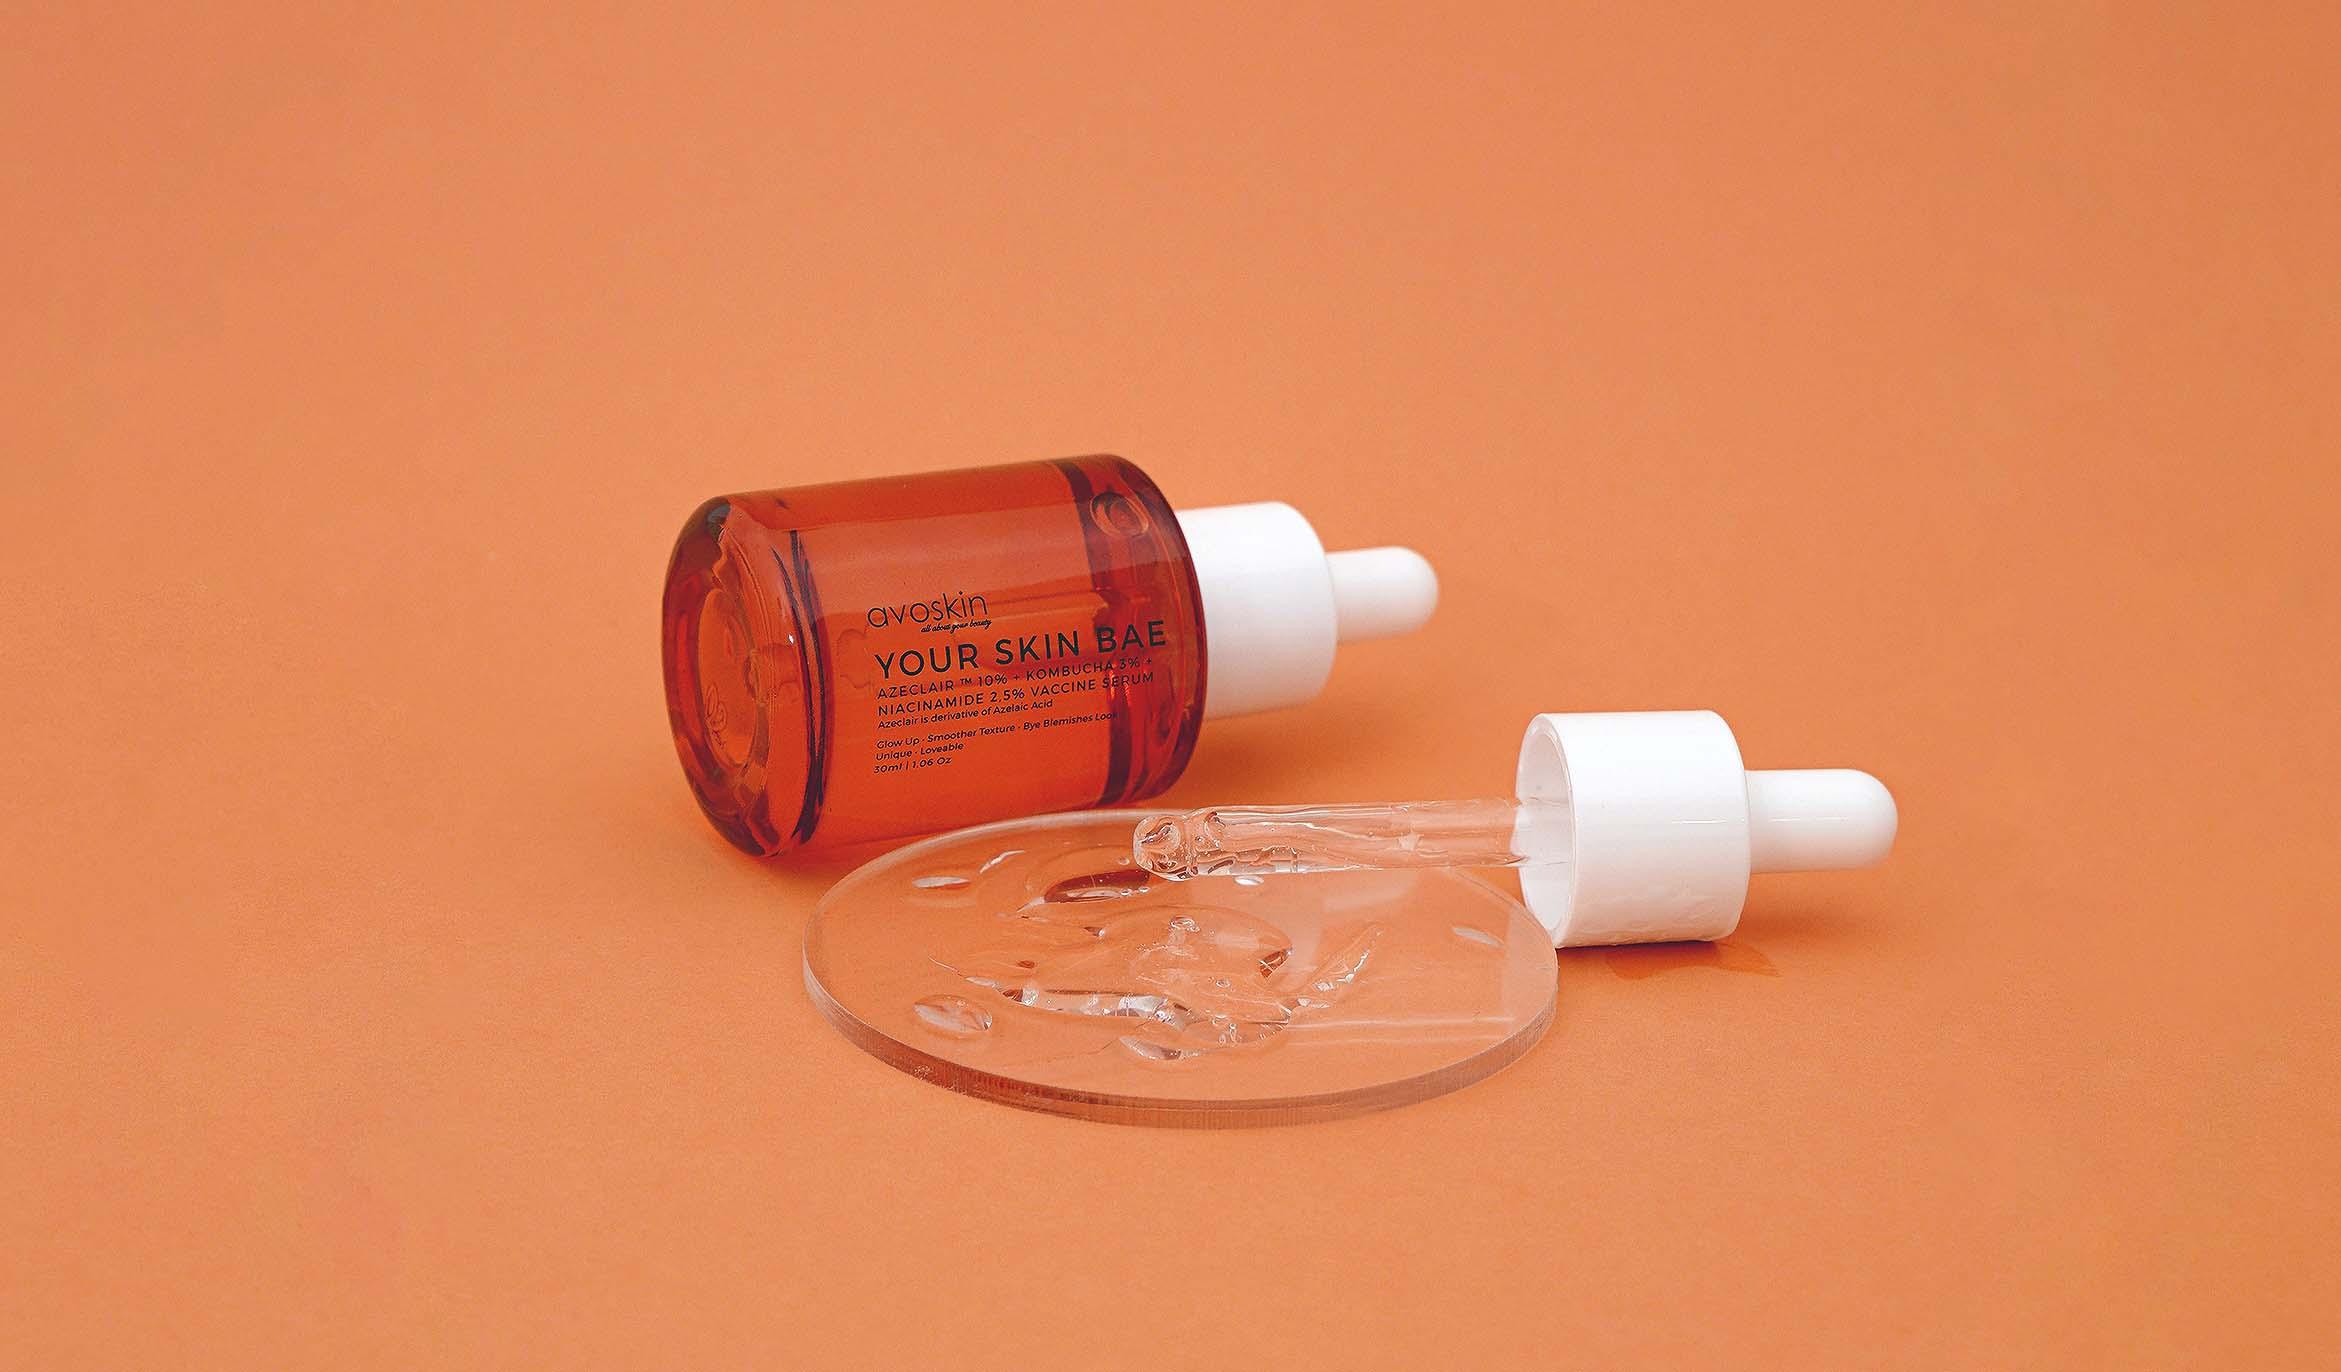 Avoskin Your Skin Bae Azeclair 10% + Kombucha 3% + Niacinamide 2,5% Vaccine Serum